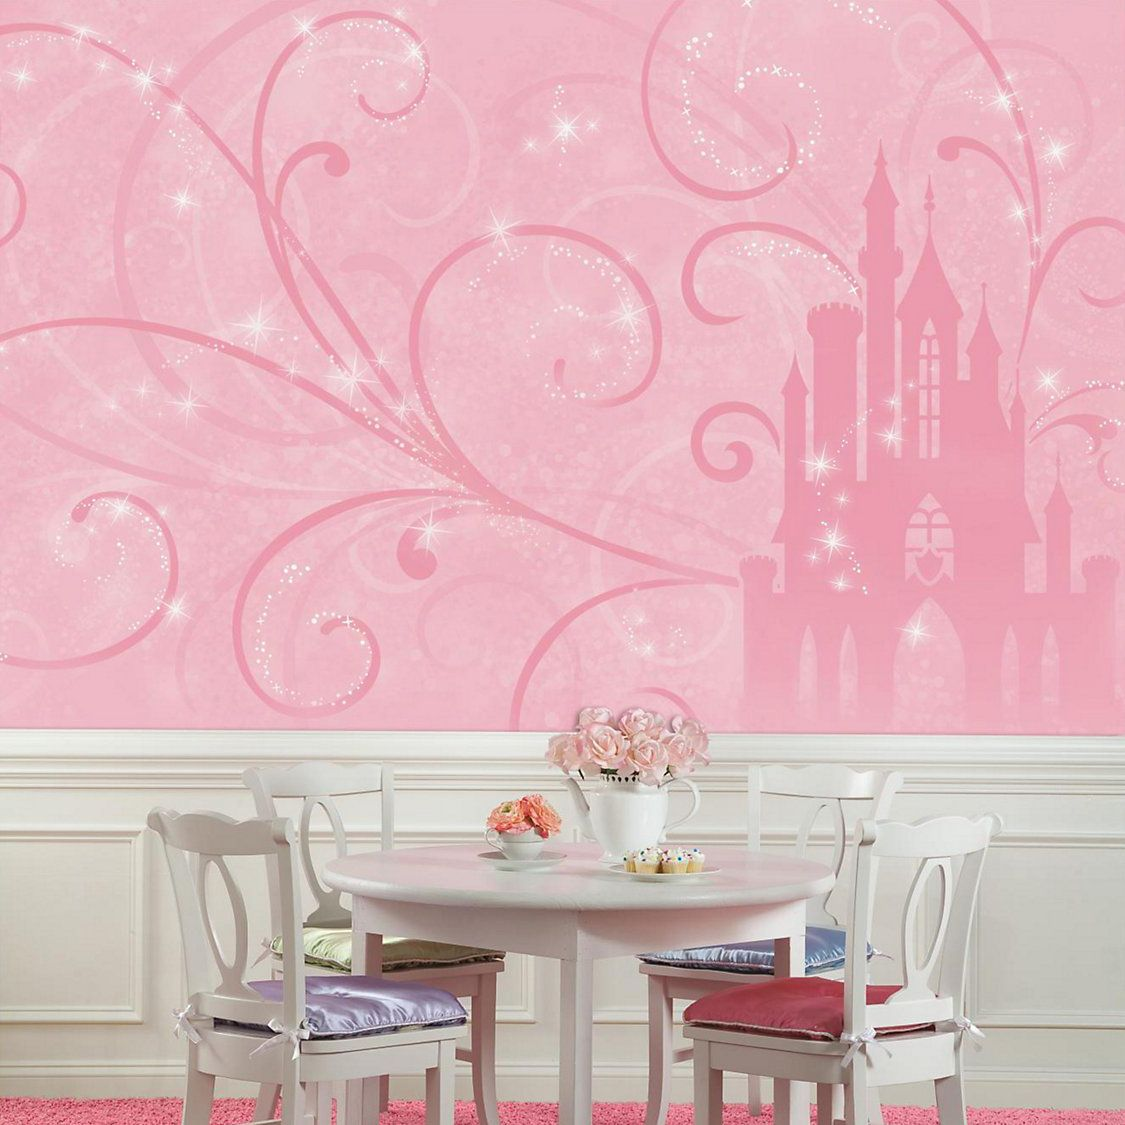 Princess Scroll Castle Removable Wallpaper Mural In 2021 Disney Princess Room Disney Mural Disney Wall